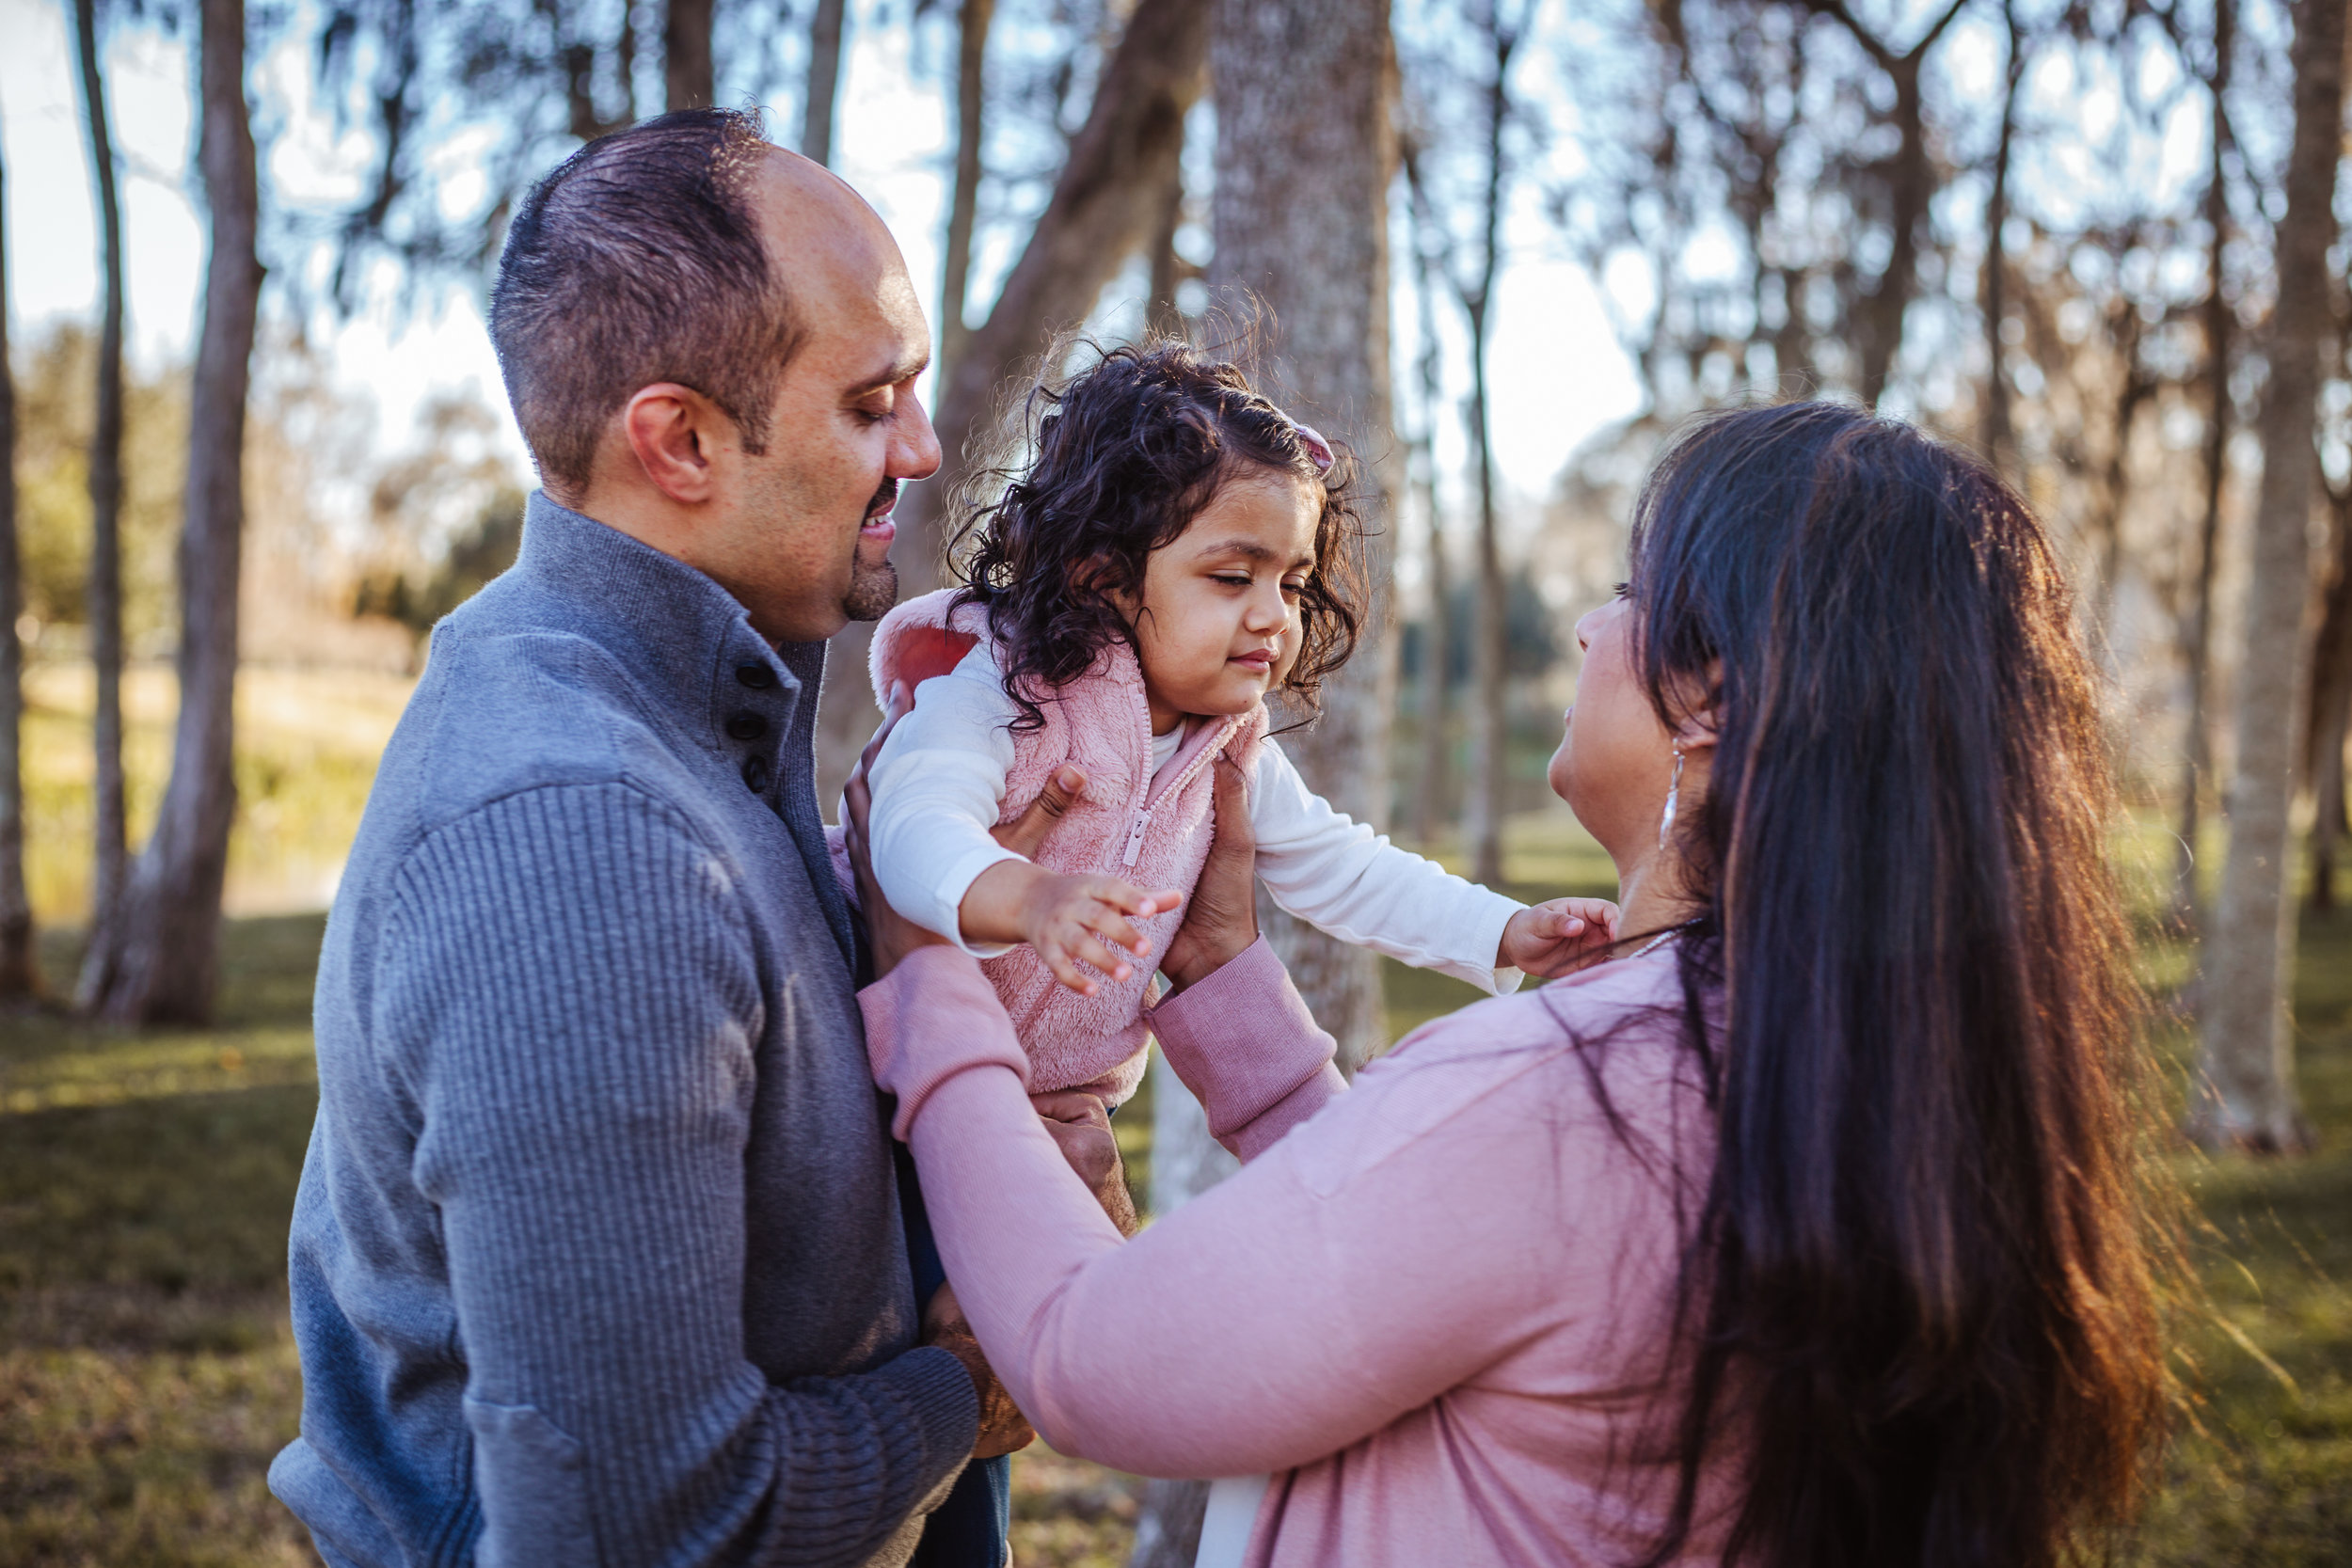 Missouri City Family Photographer | zinnphotography.net